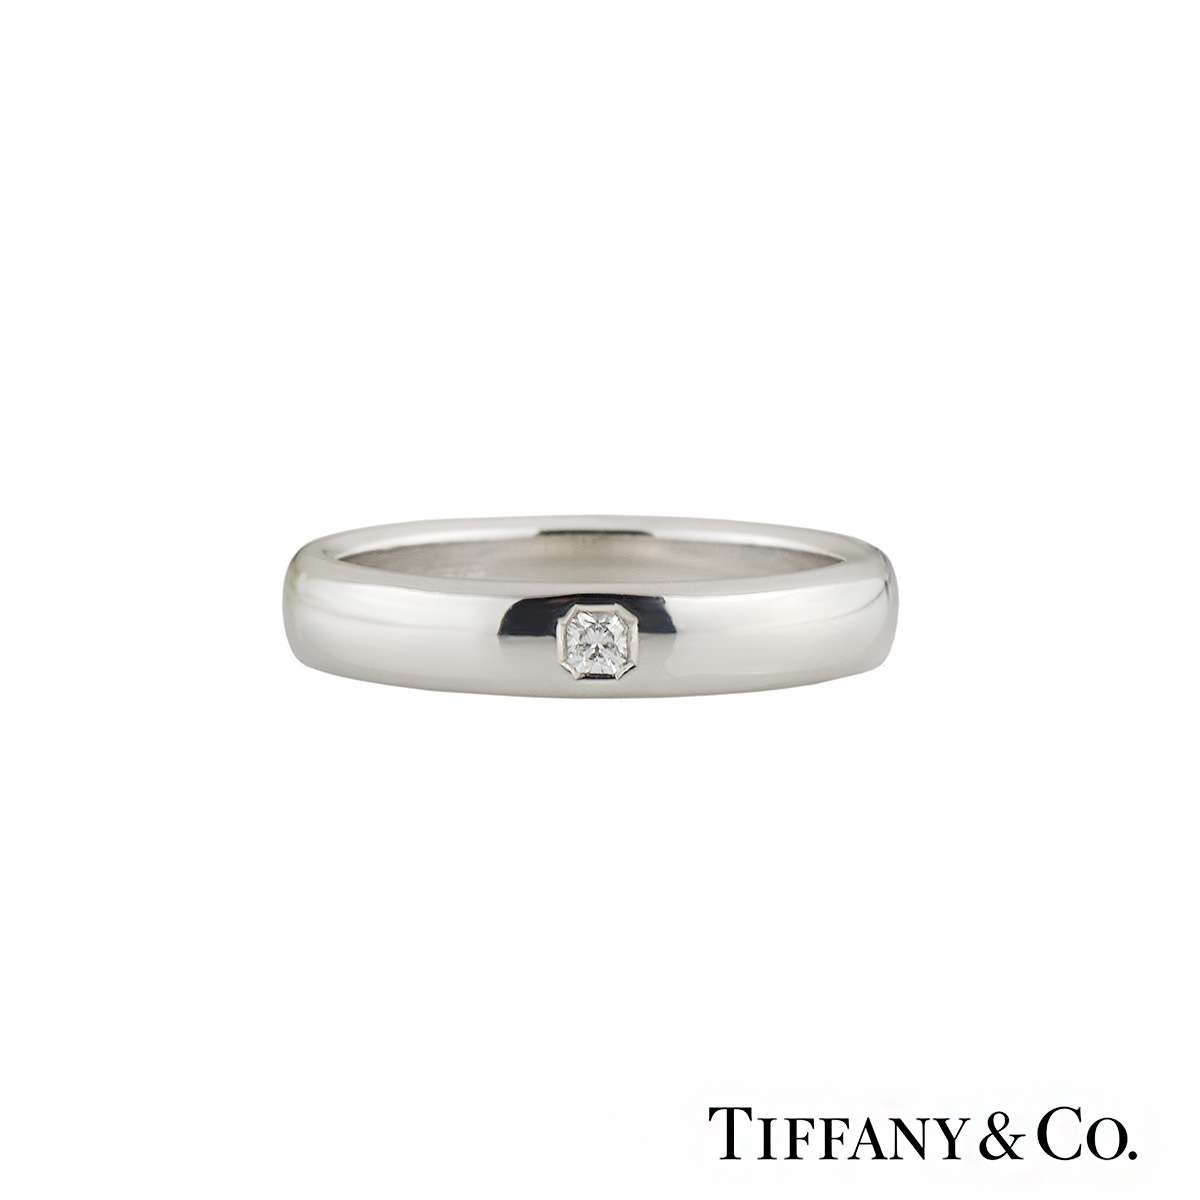 Lucida Bands: Tiffany & Co. Lucida Diamond Wedding Band In Platinum